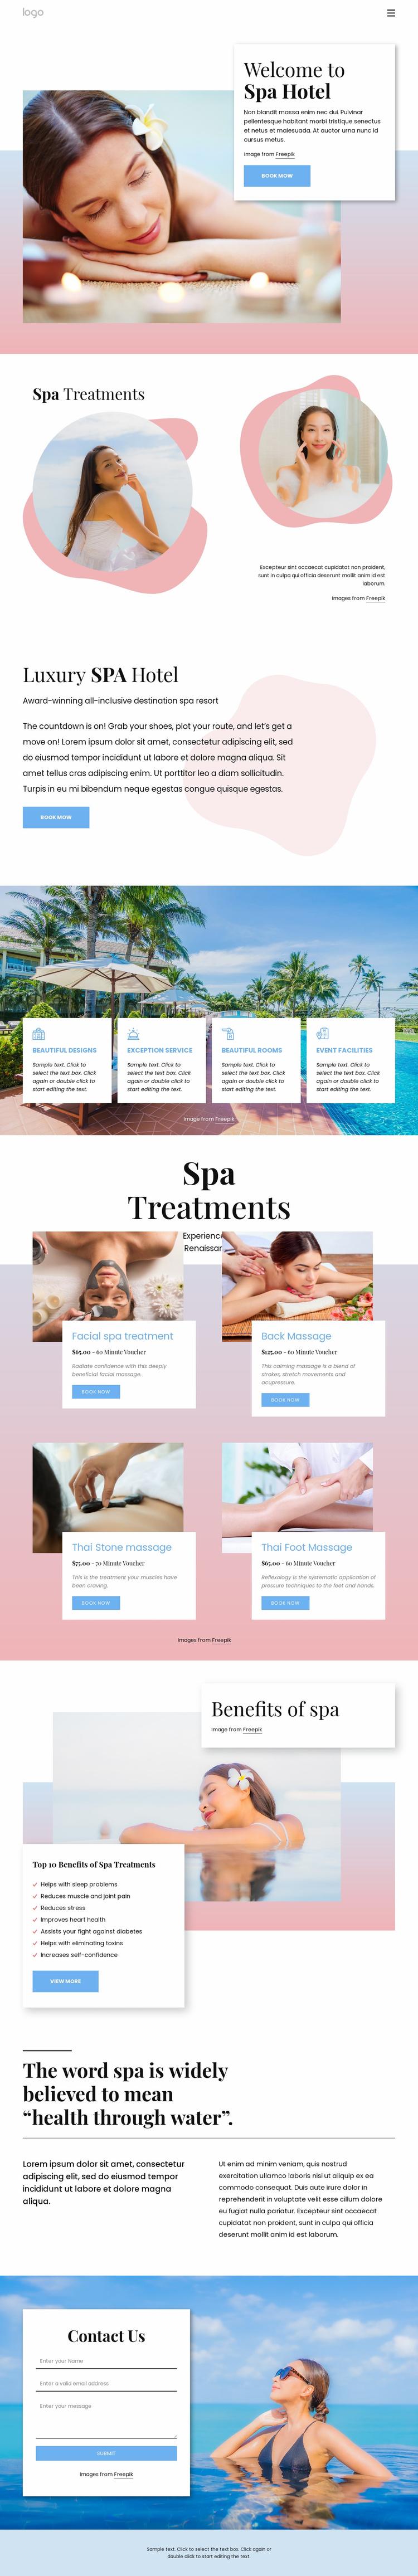 Spa boutique hotel Website Template